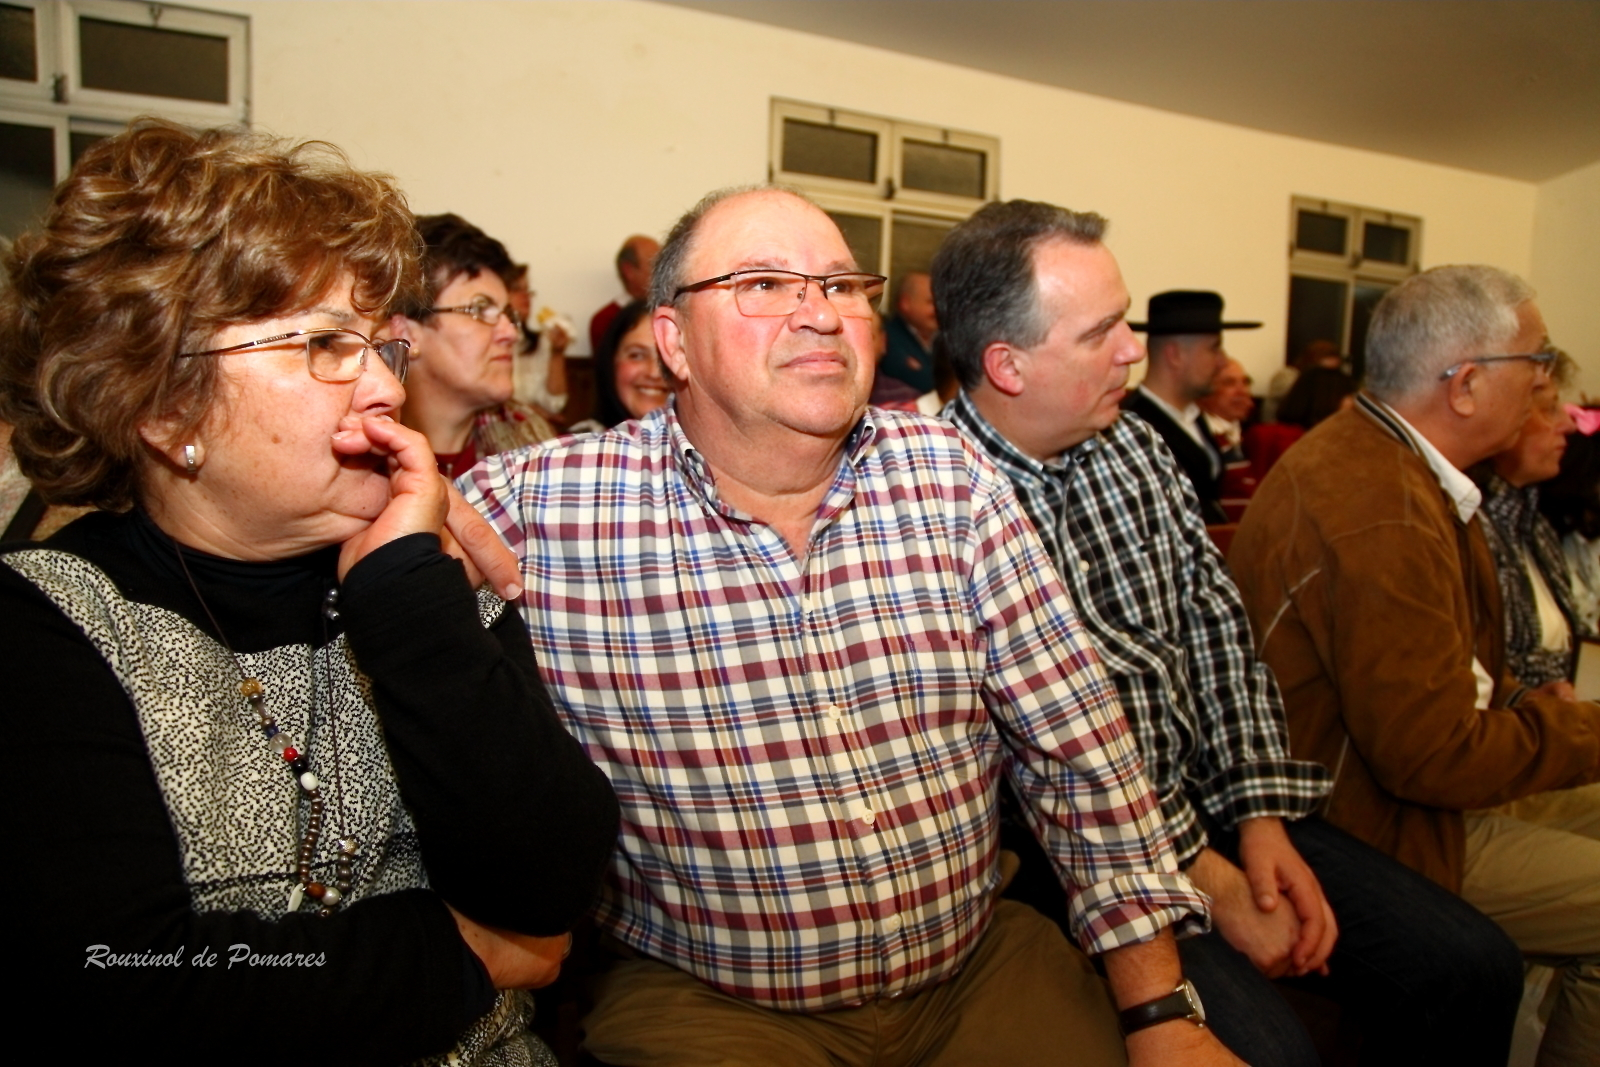 Festa Regionalista Casa da Comarca (002c)